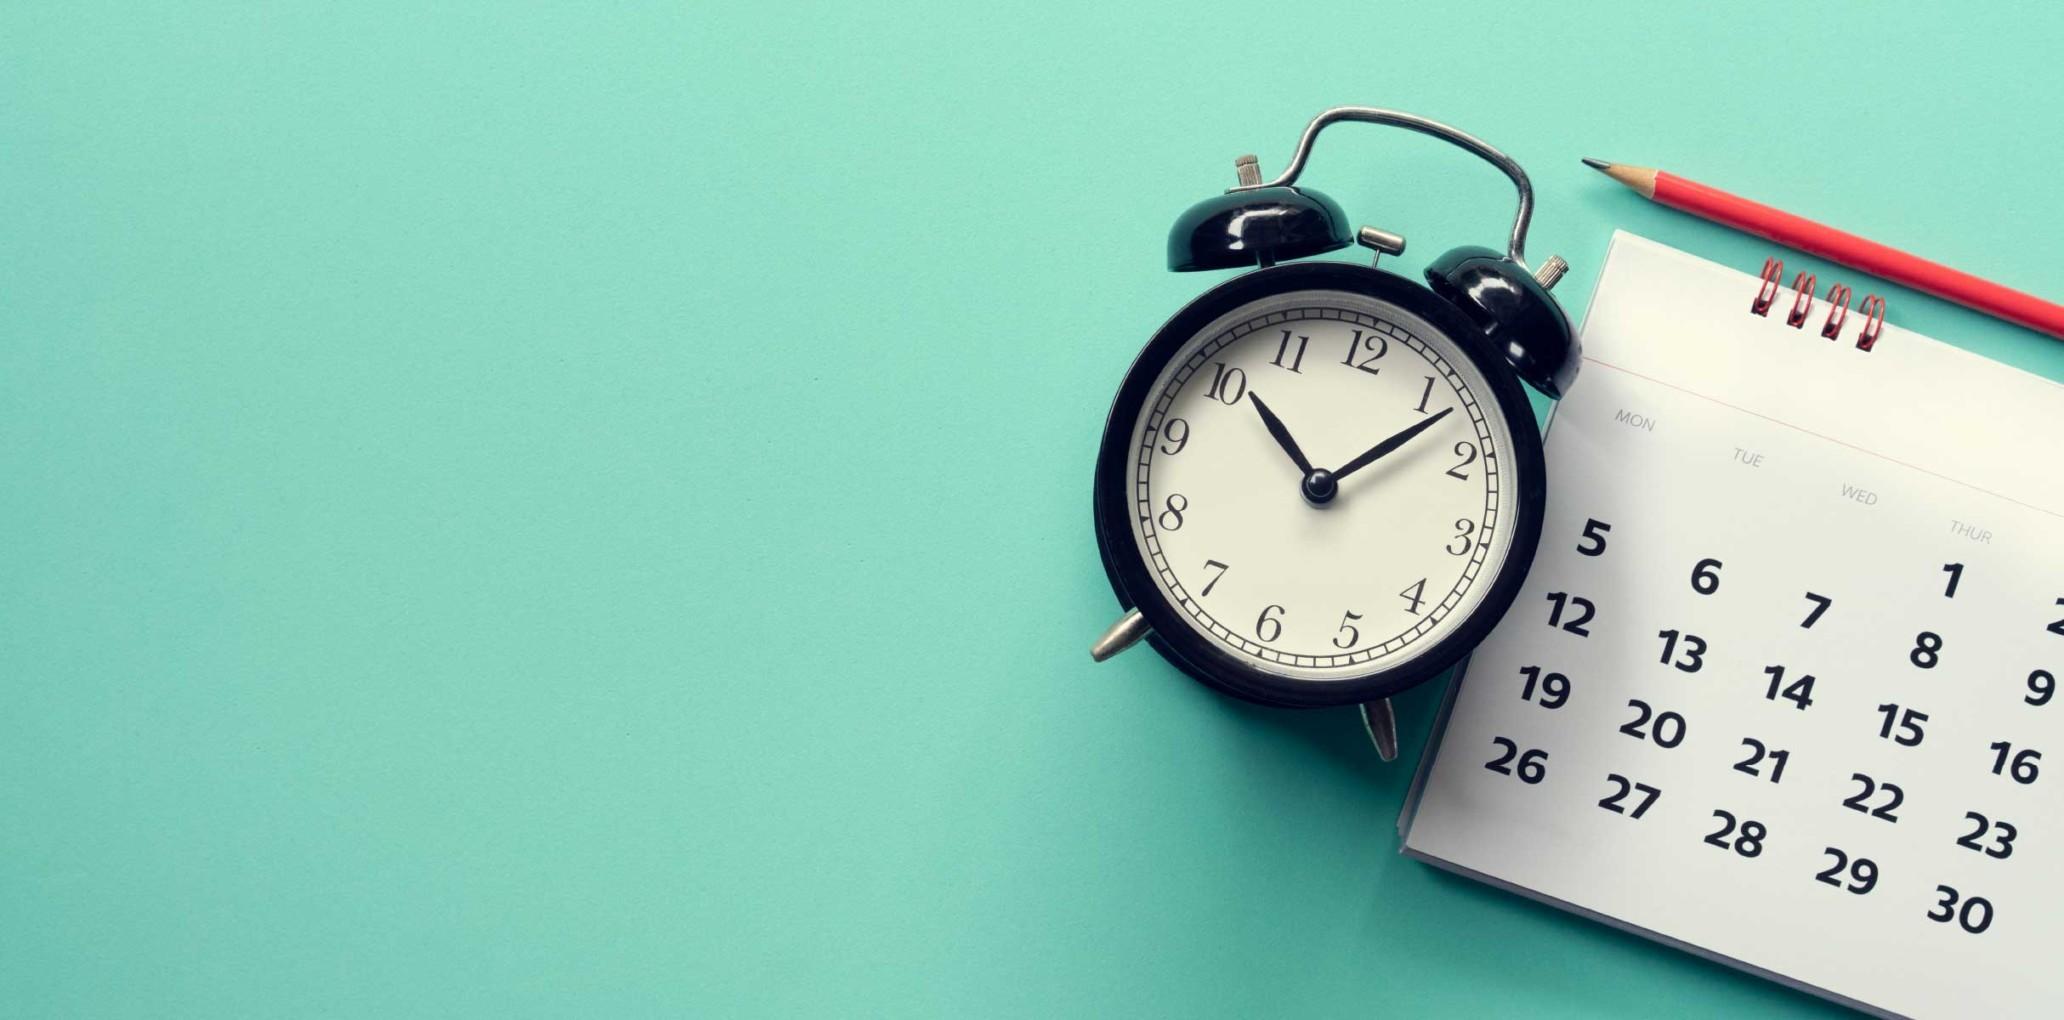 Fixed Price или Time and Material. Какую модель оплаты выбрать?